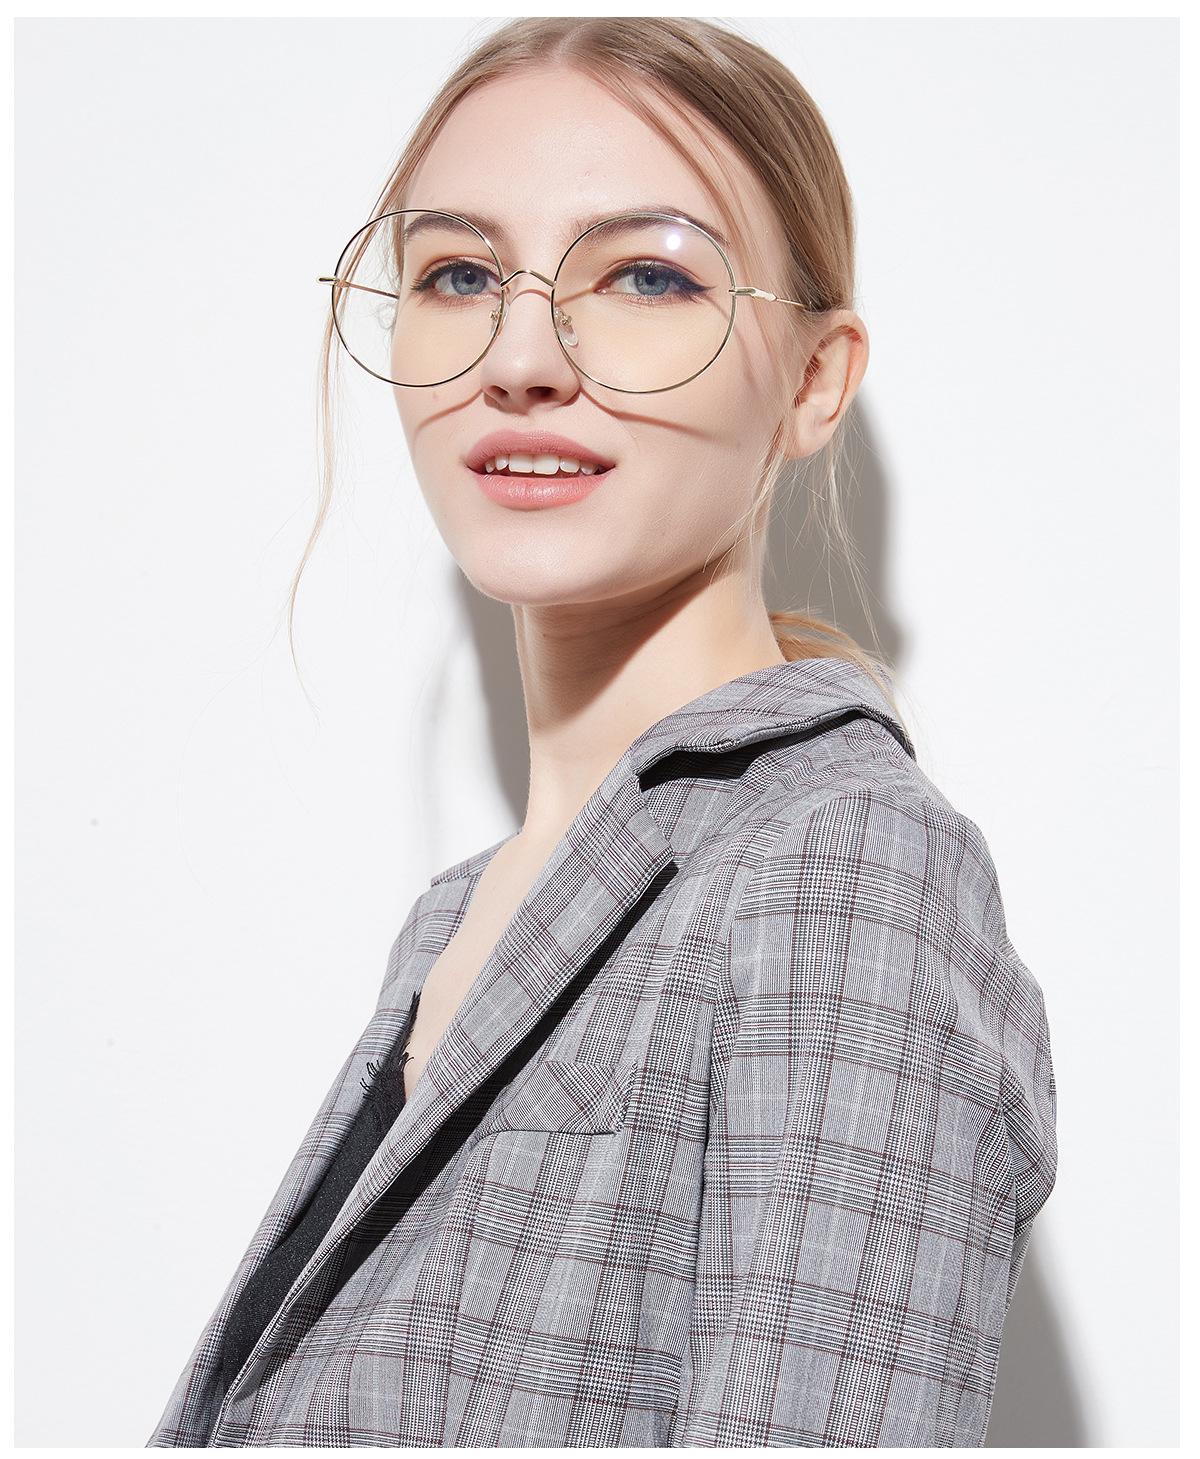 2019 New Man Woman Retro Large Round Glasses Transparent Metal Eyeglass Frame Black Silver Gold Spectacles Eyeglasses 3 Colors Men's Eyewear Frames Men's Glasses